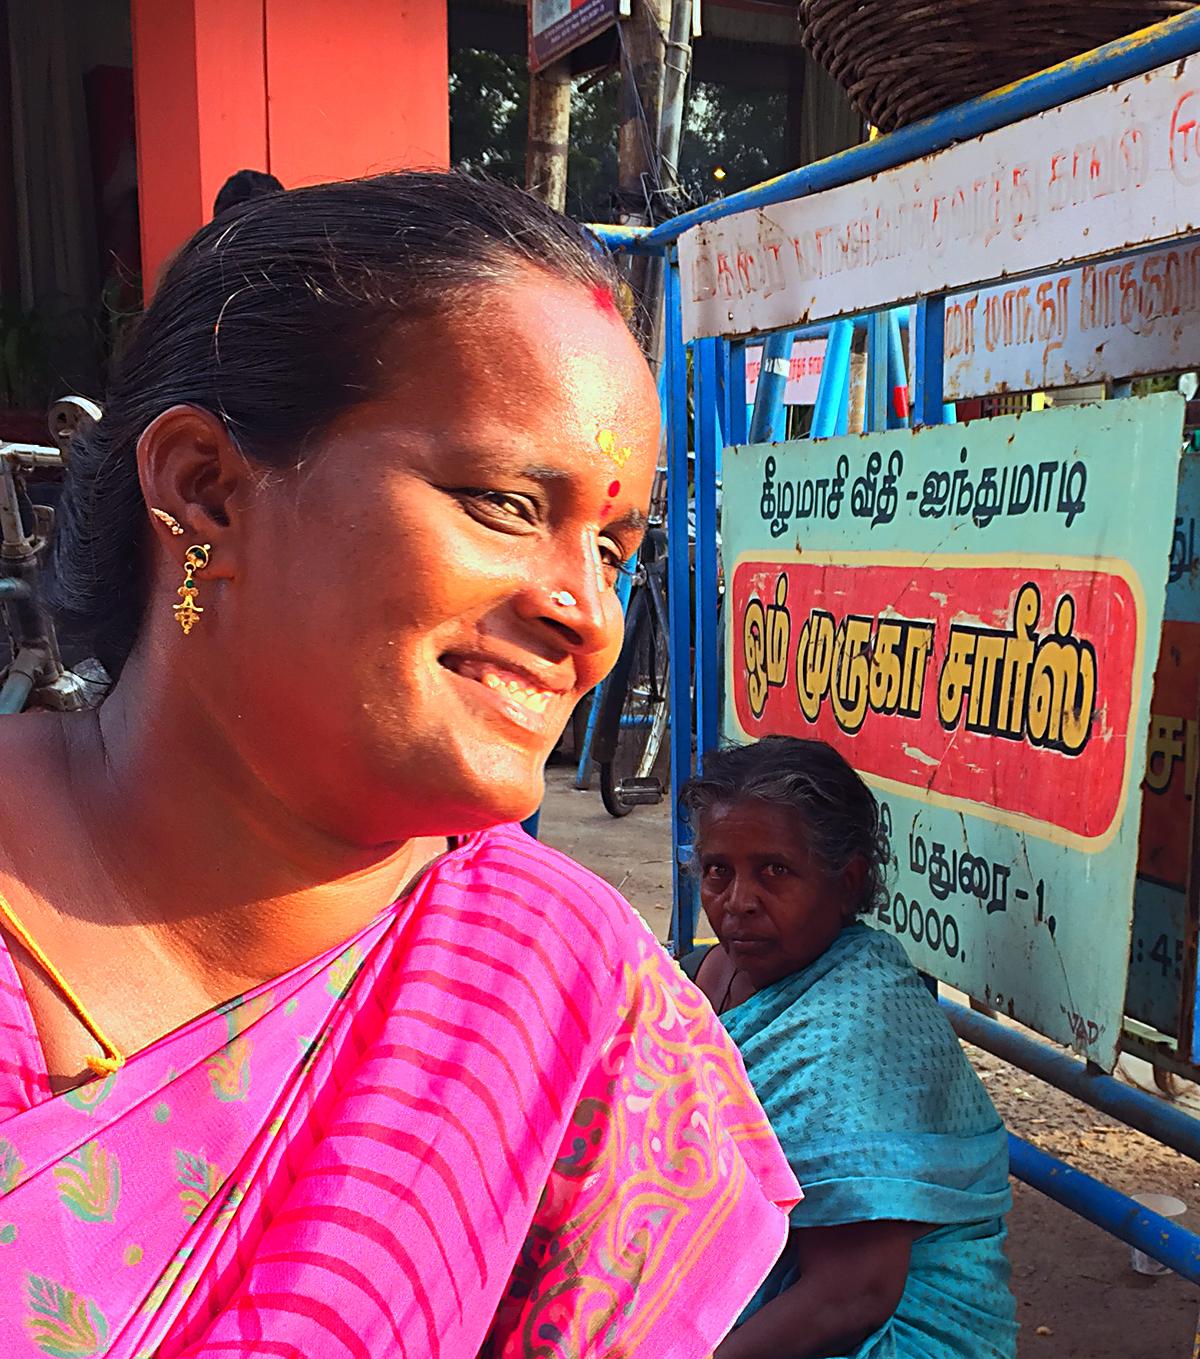 INDIEN Chennai Kanchipuram Tempel Menschen Tempel FINEST-onTour 2174.jpg